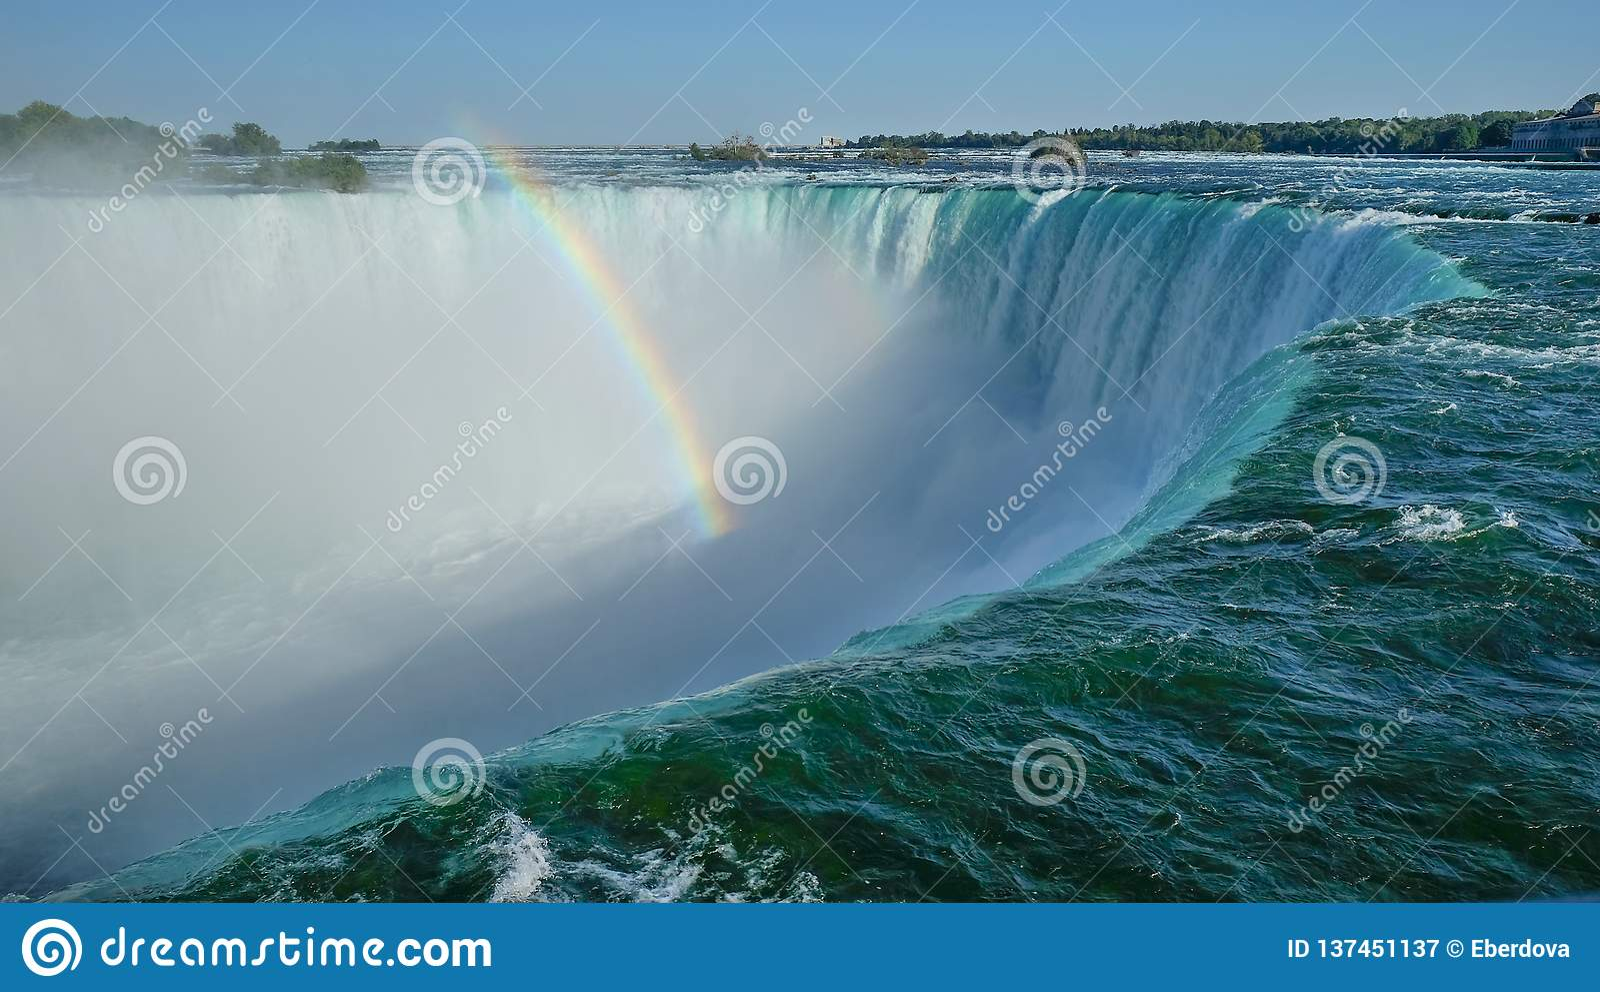 Ideia unabstracted próxima da borda do penhasco de Niagara Falls do lado canadense